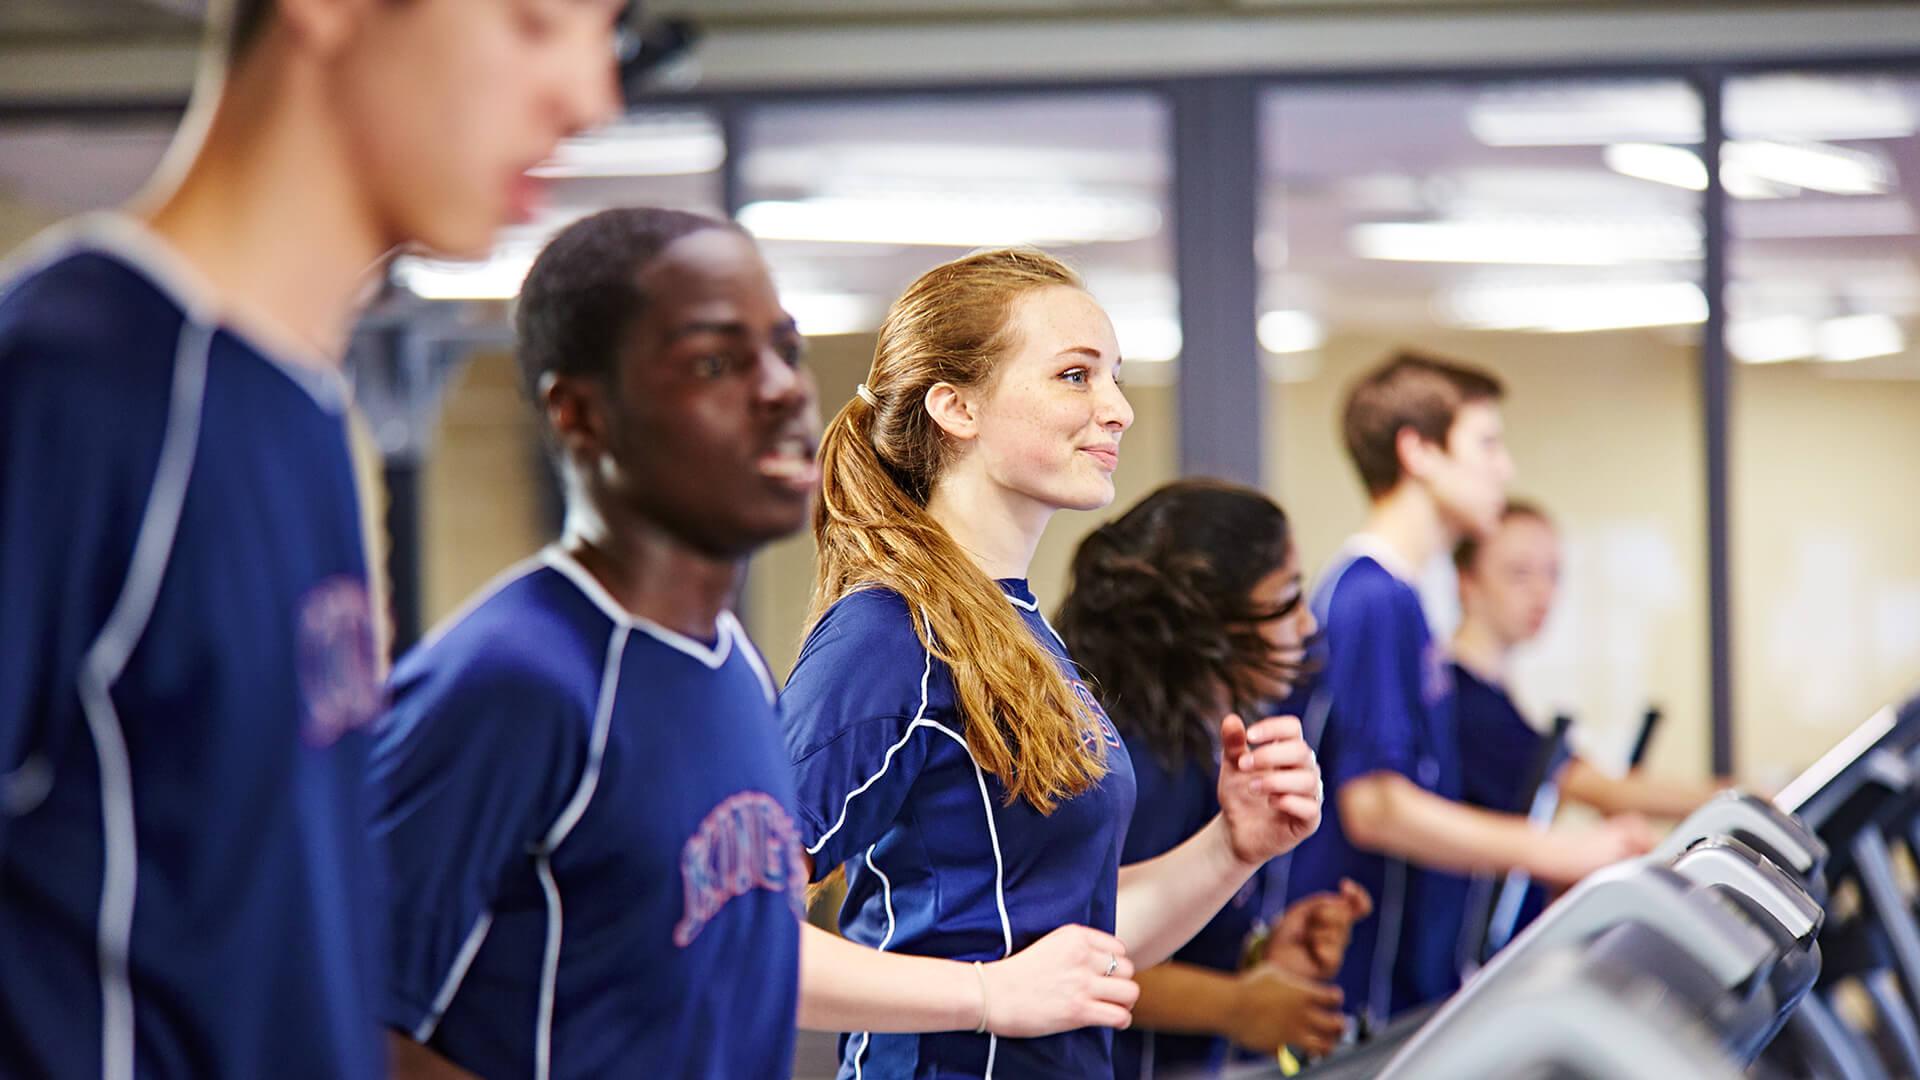 students exercising on treadmills